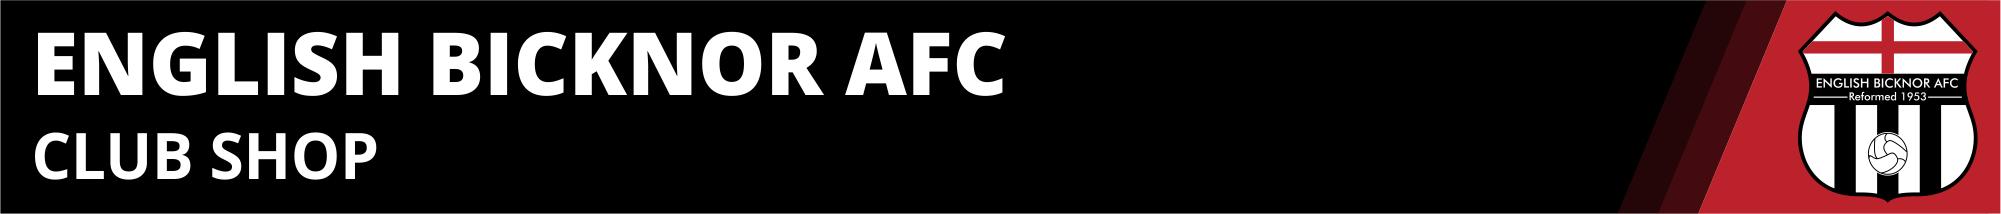 english-bicknor-afc-club-shop-banner.png